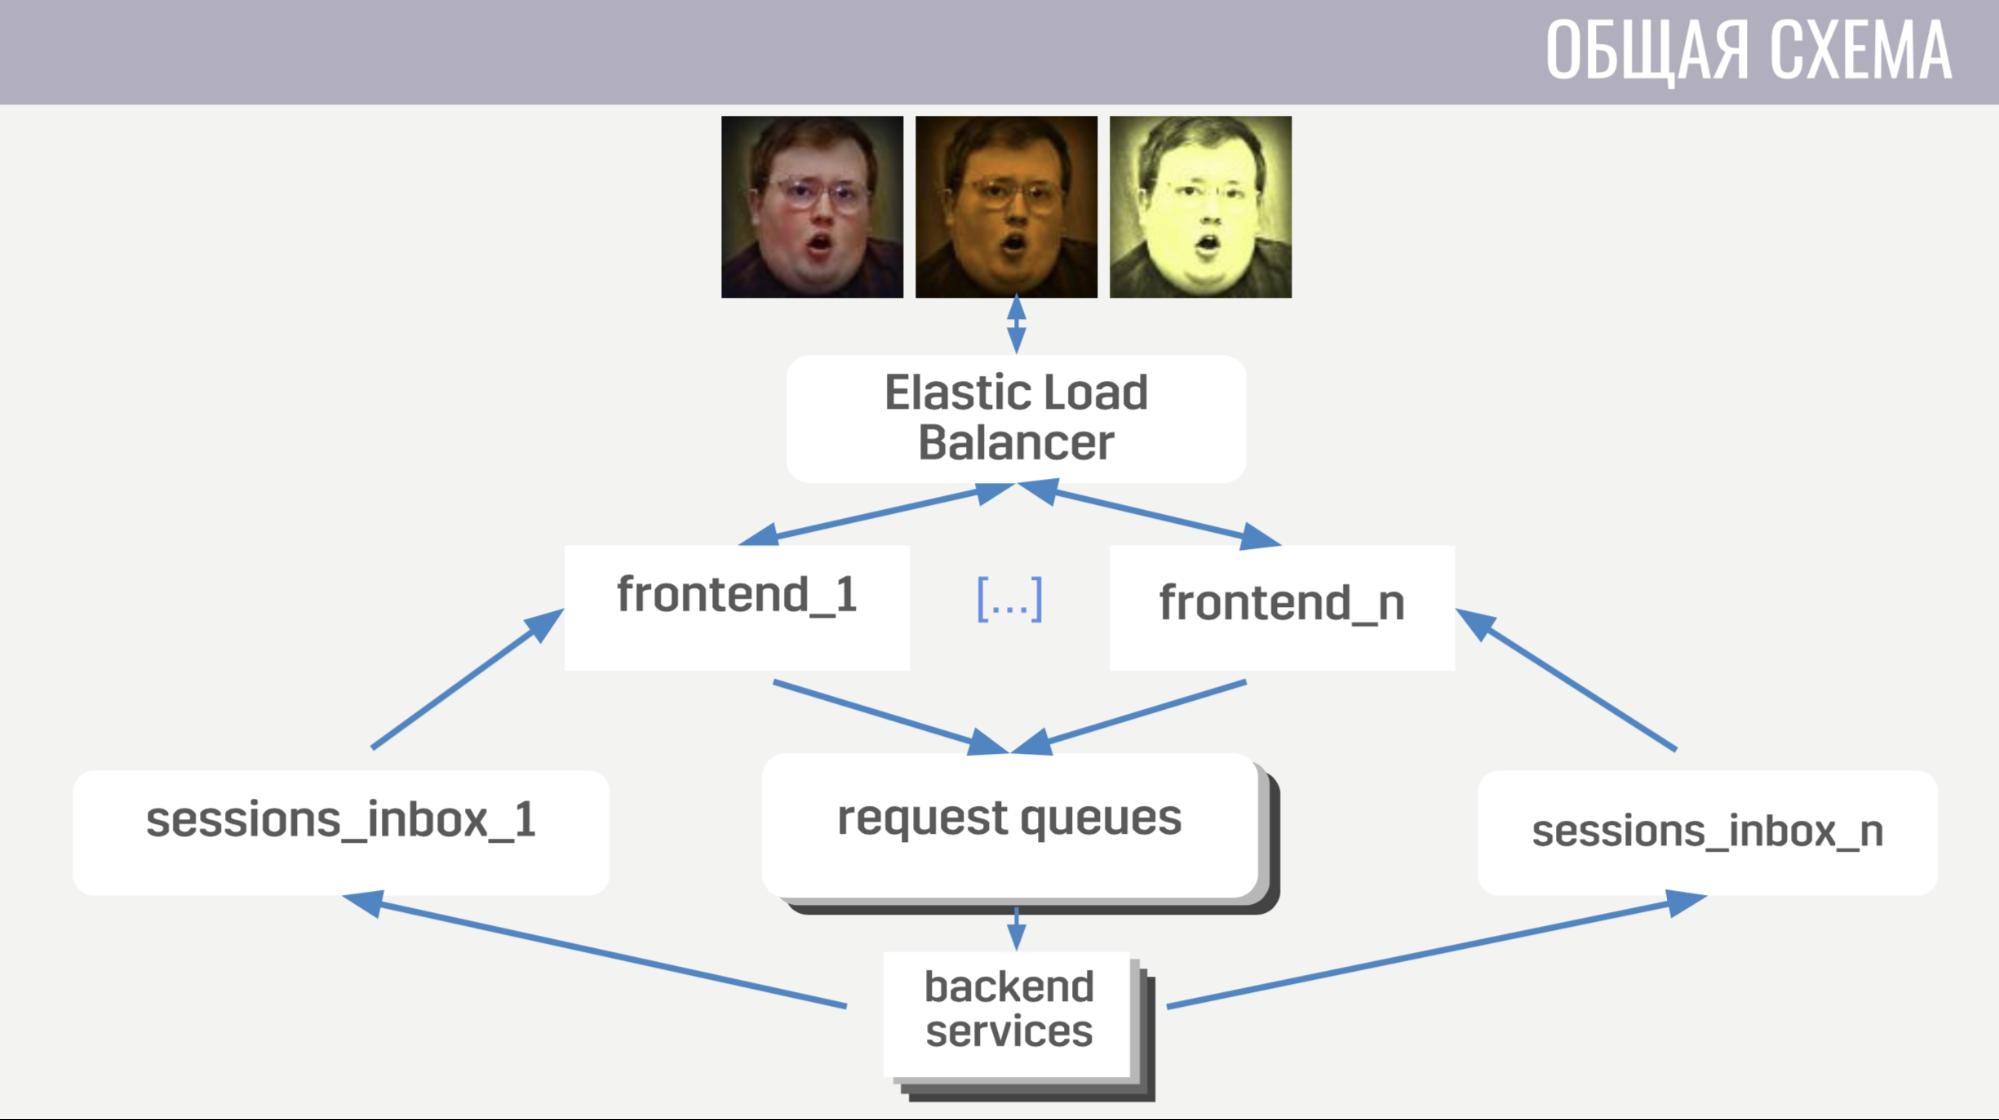 Архитектура мета-сервера мобильного онлайн-шутера Tacticool - 5